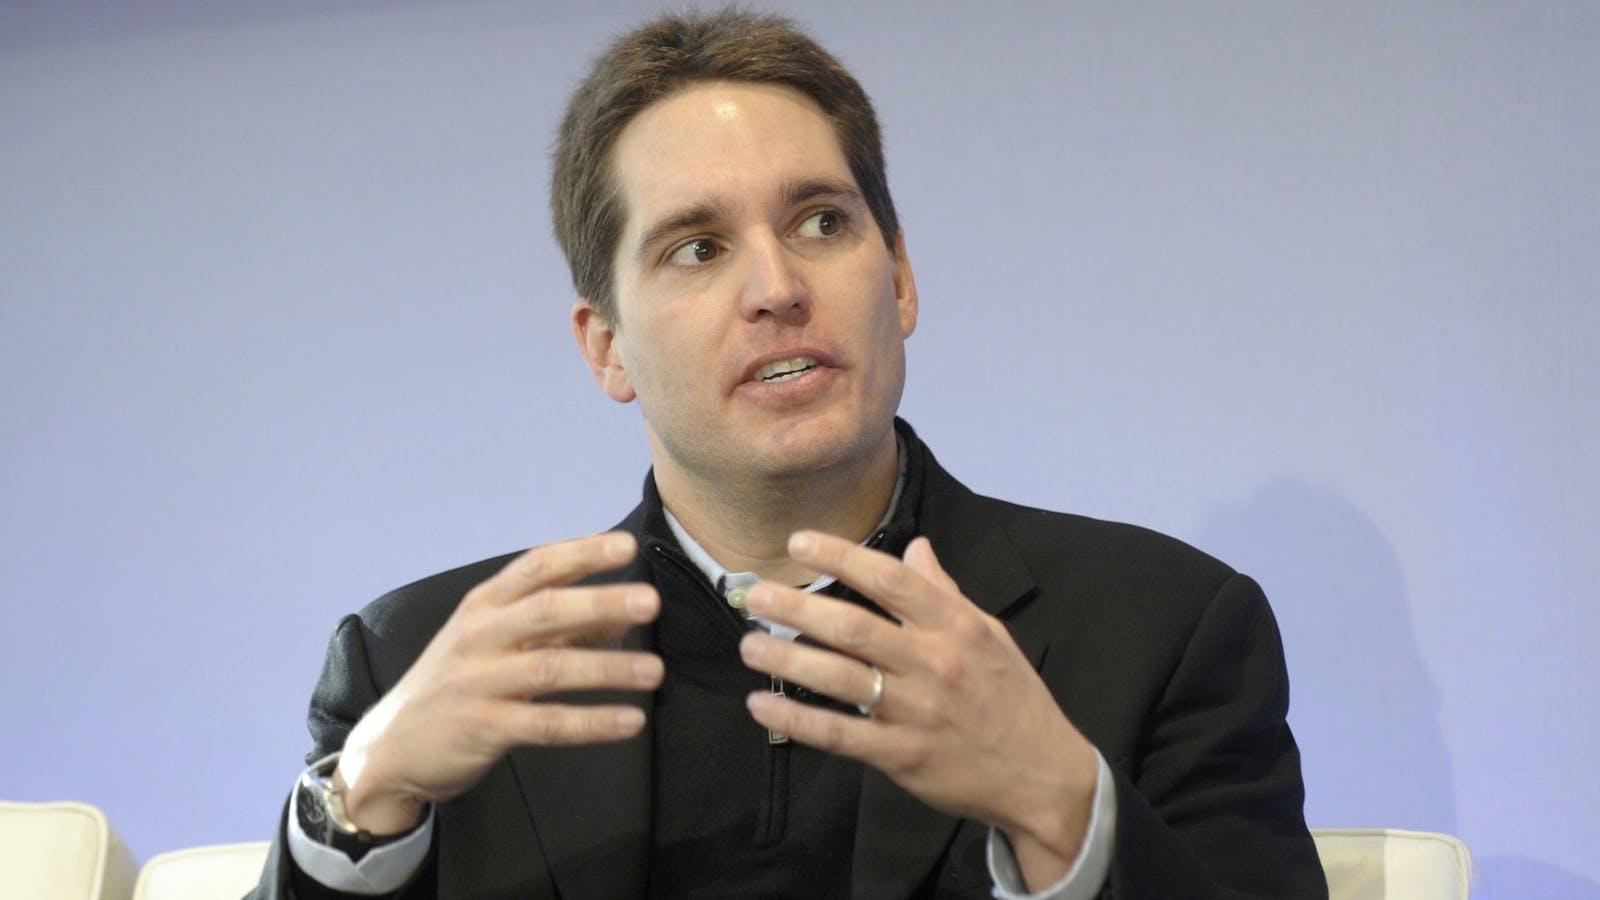 WarnerMedia CEO Jason Kilar. Photo by Bloomberg